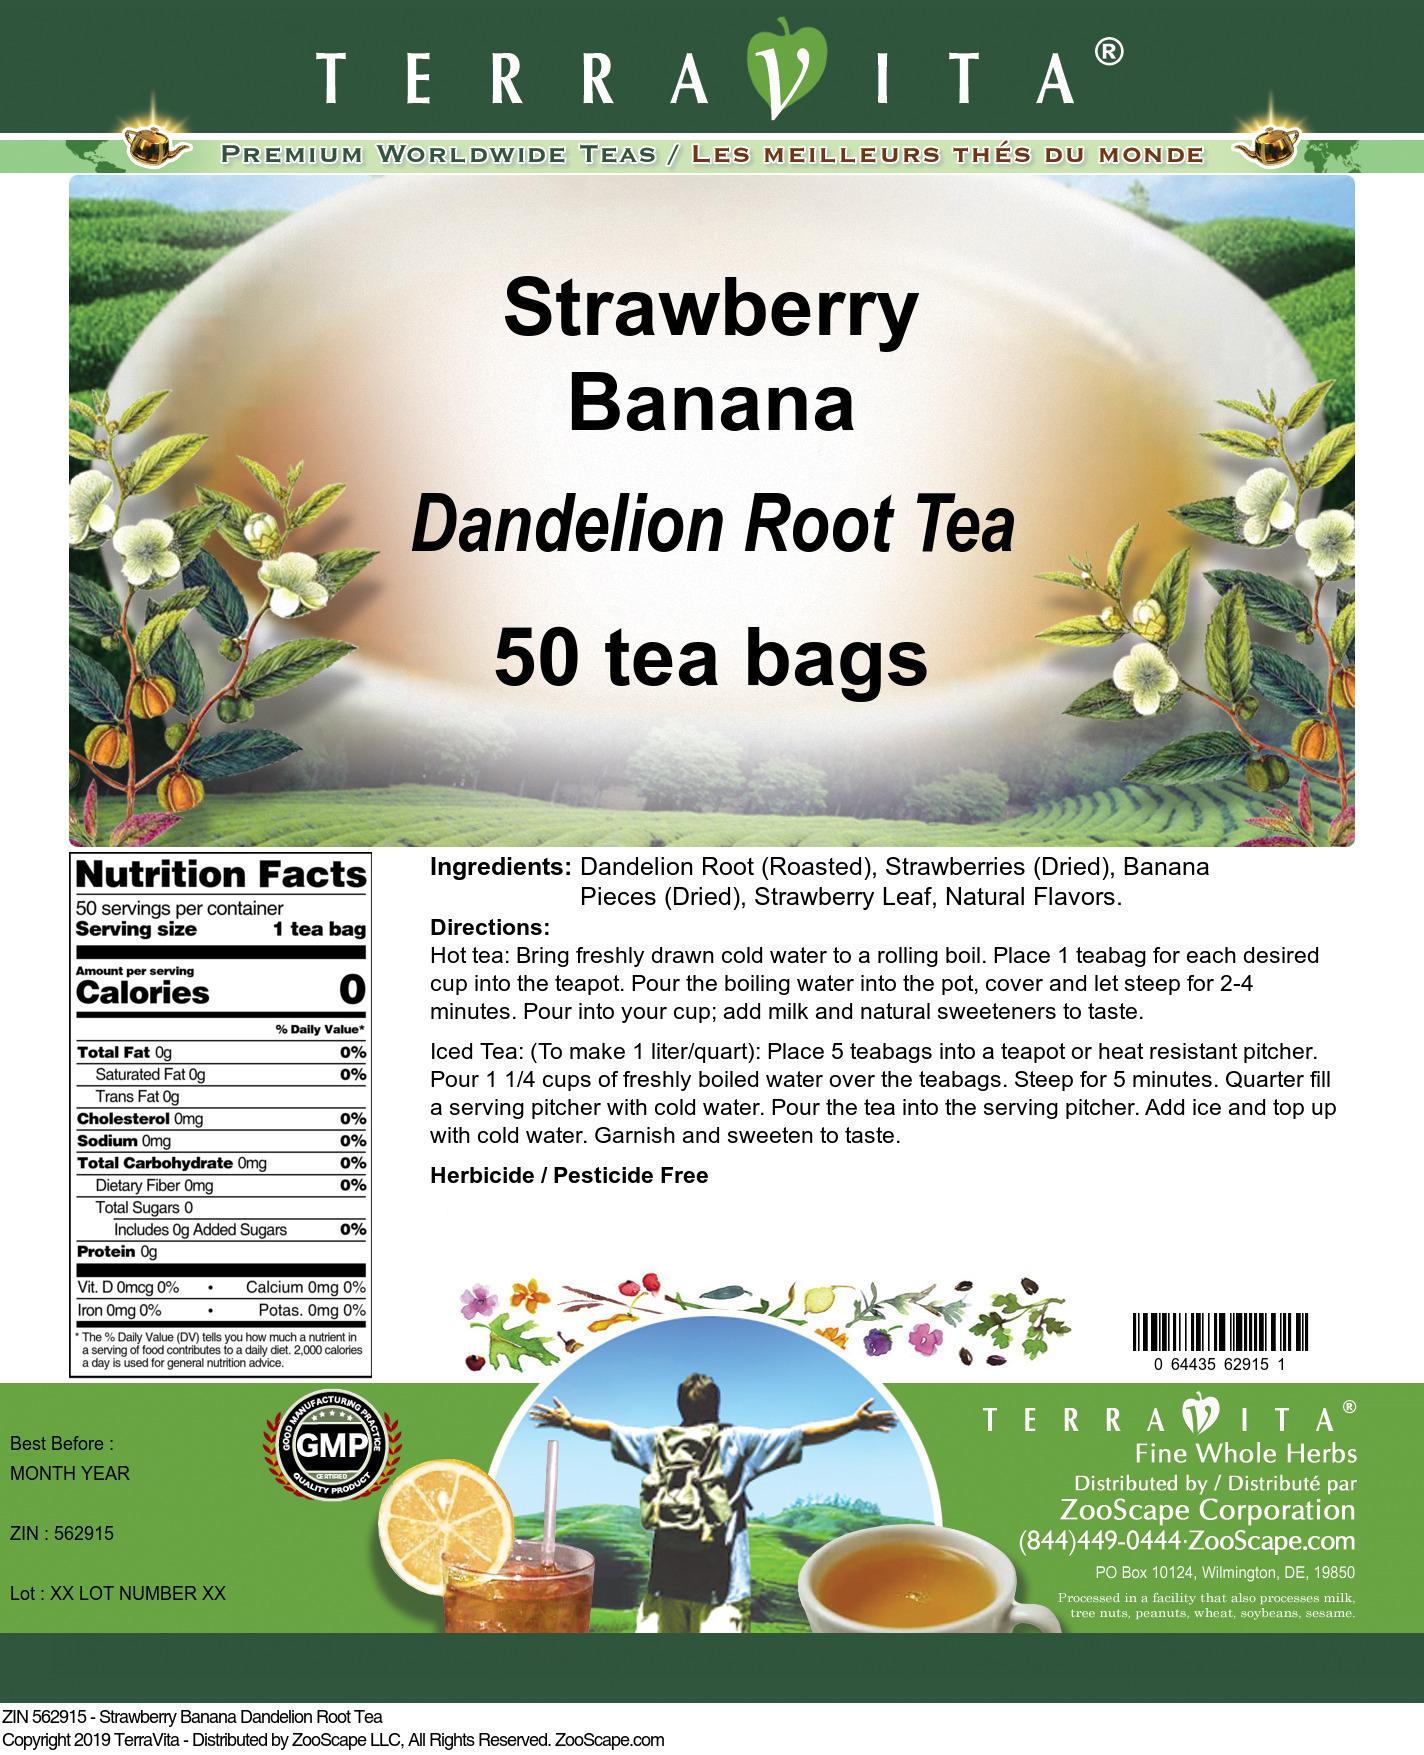 Strawberry Banana Dandelion Root Tea